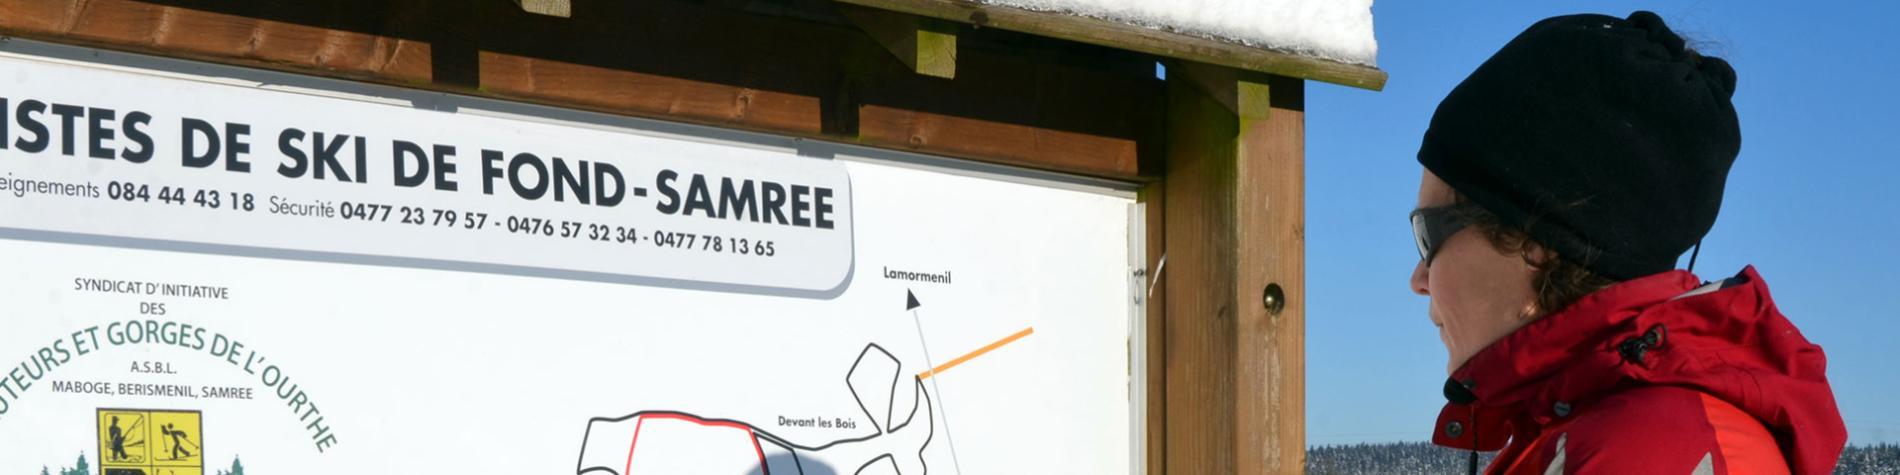 HGO - centre de ski nordique - Samrée